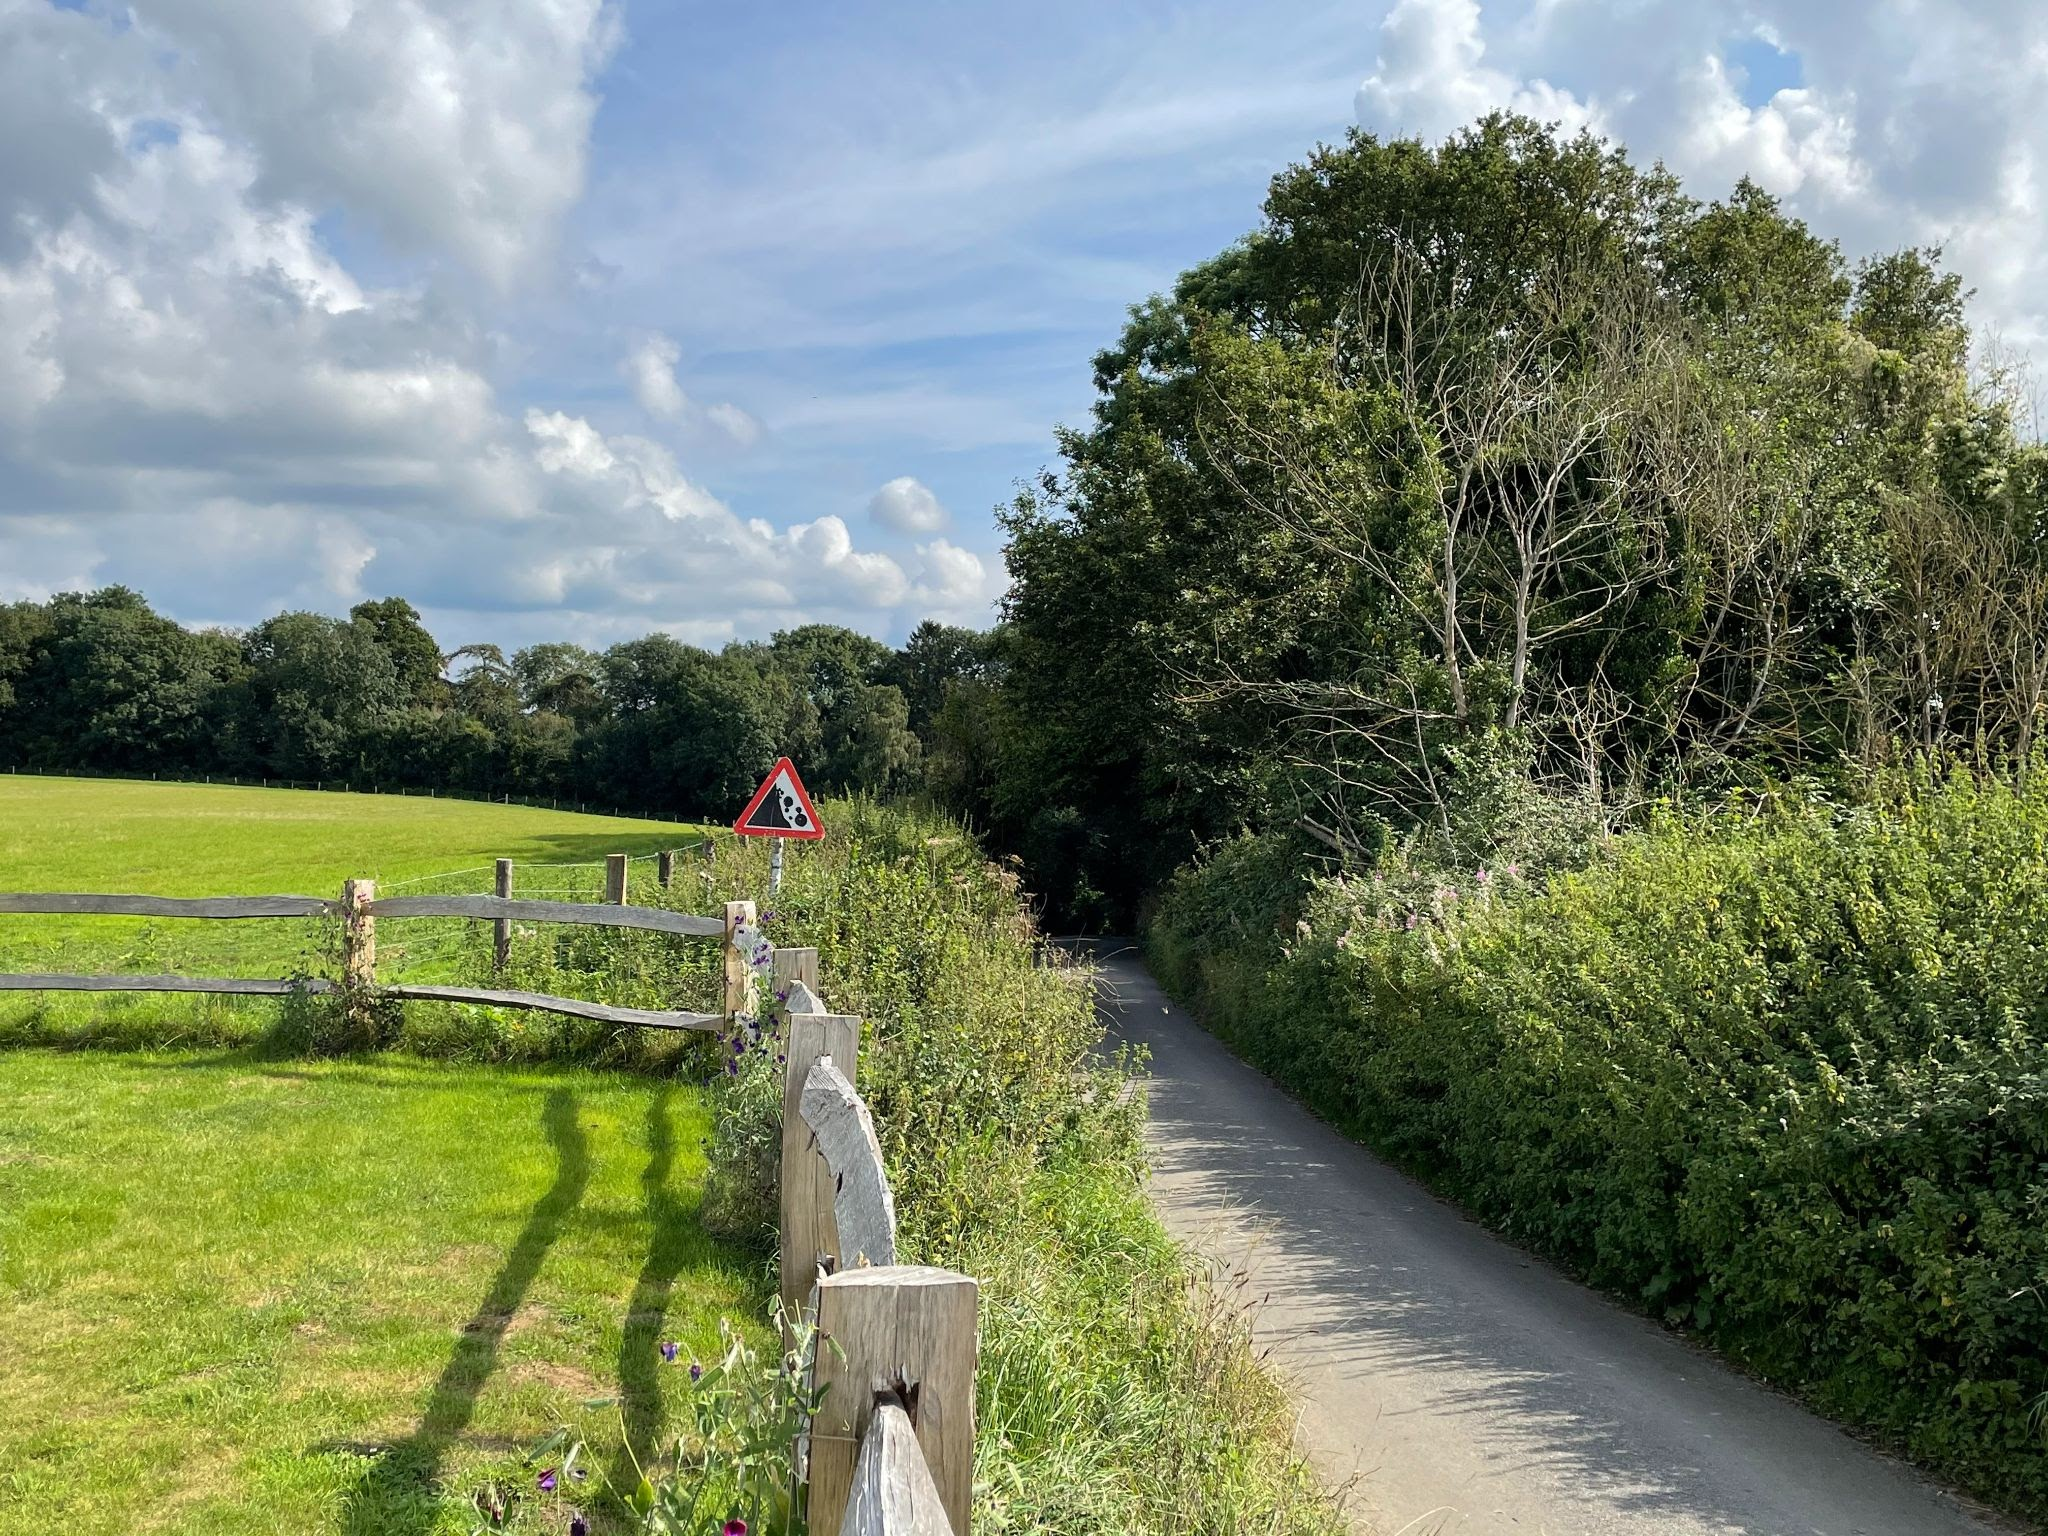 Gravel bike path